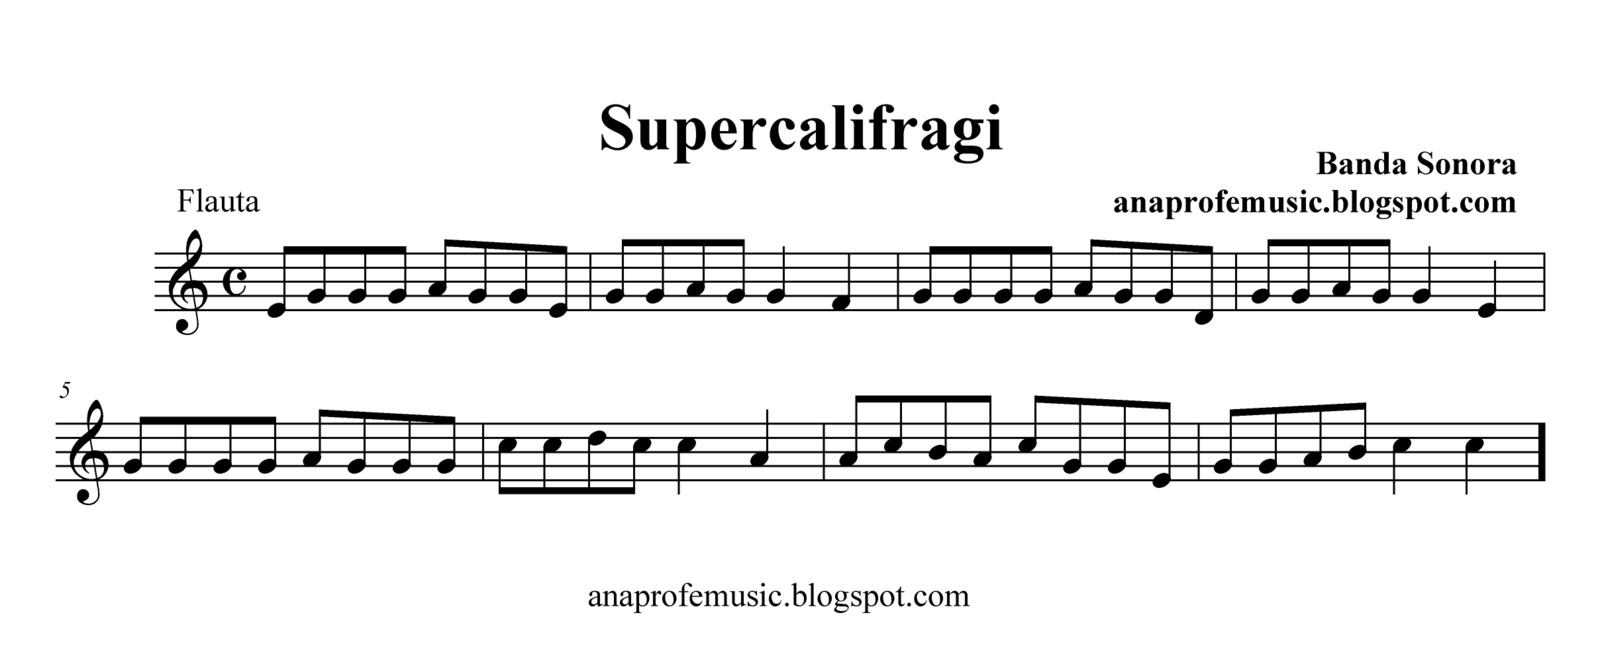 PARTITURA SUPERC...V Is For Violin